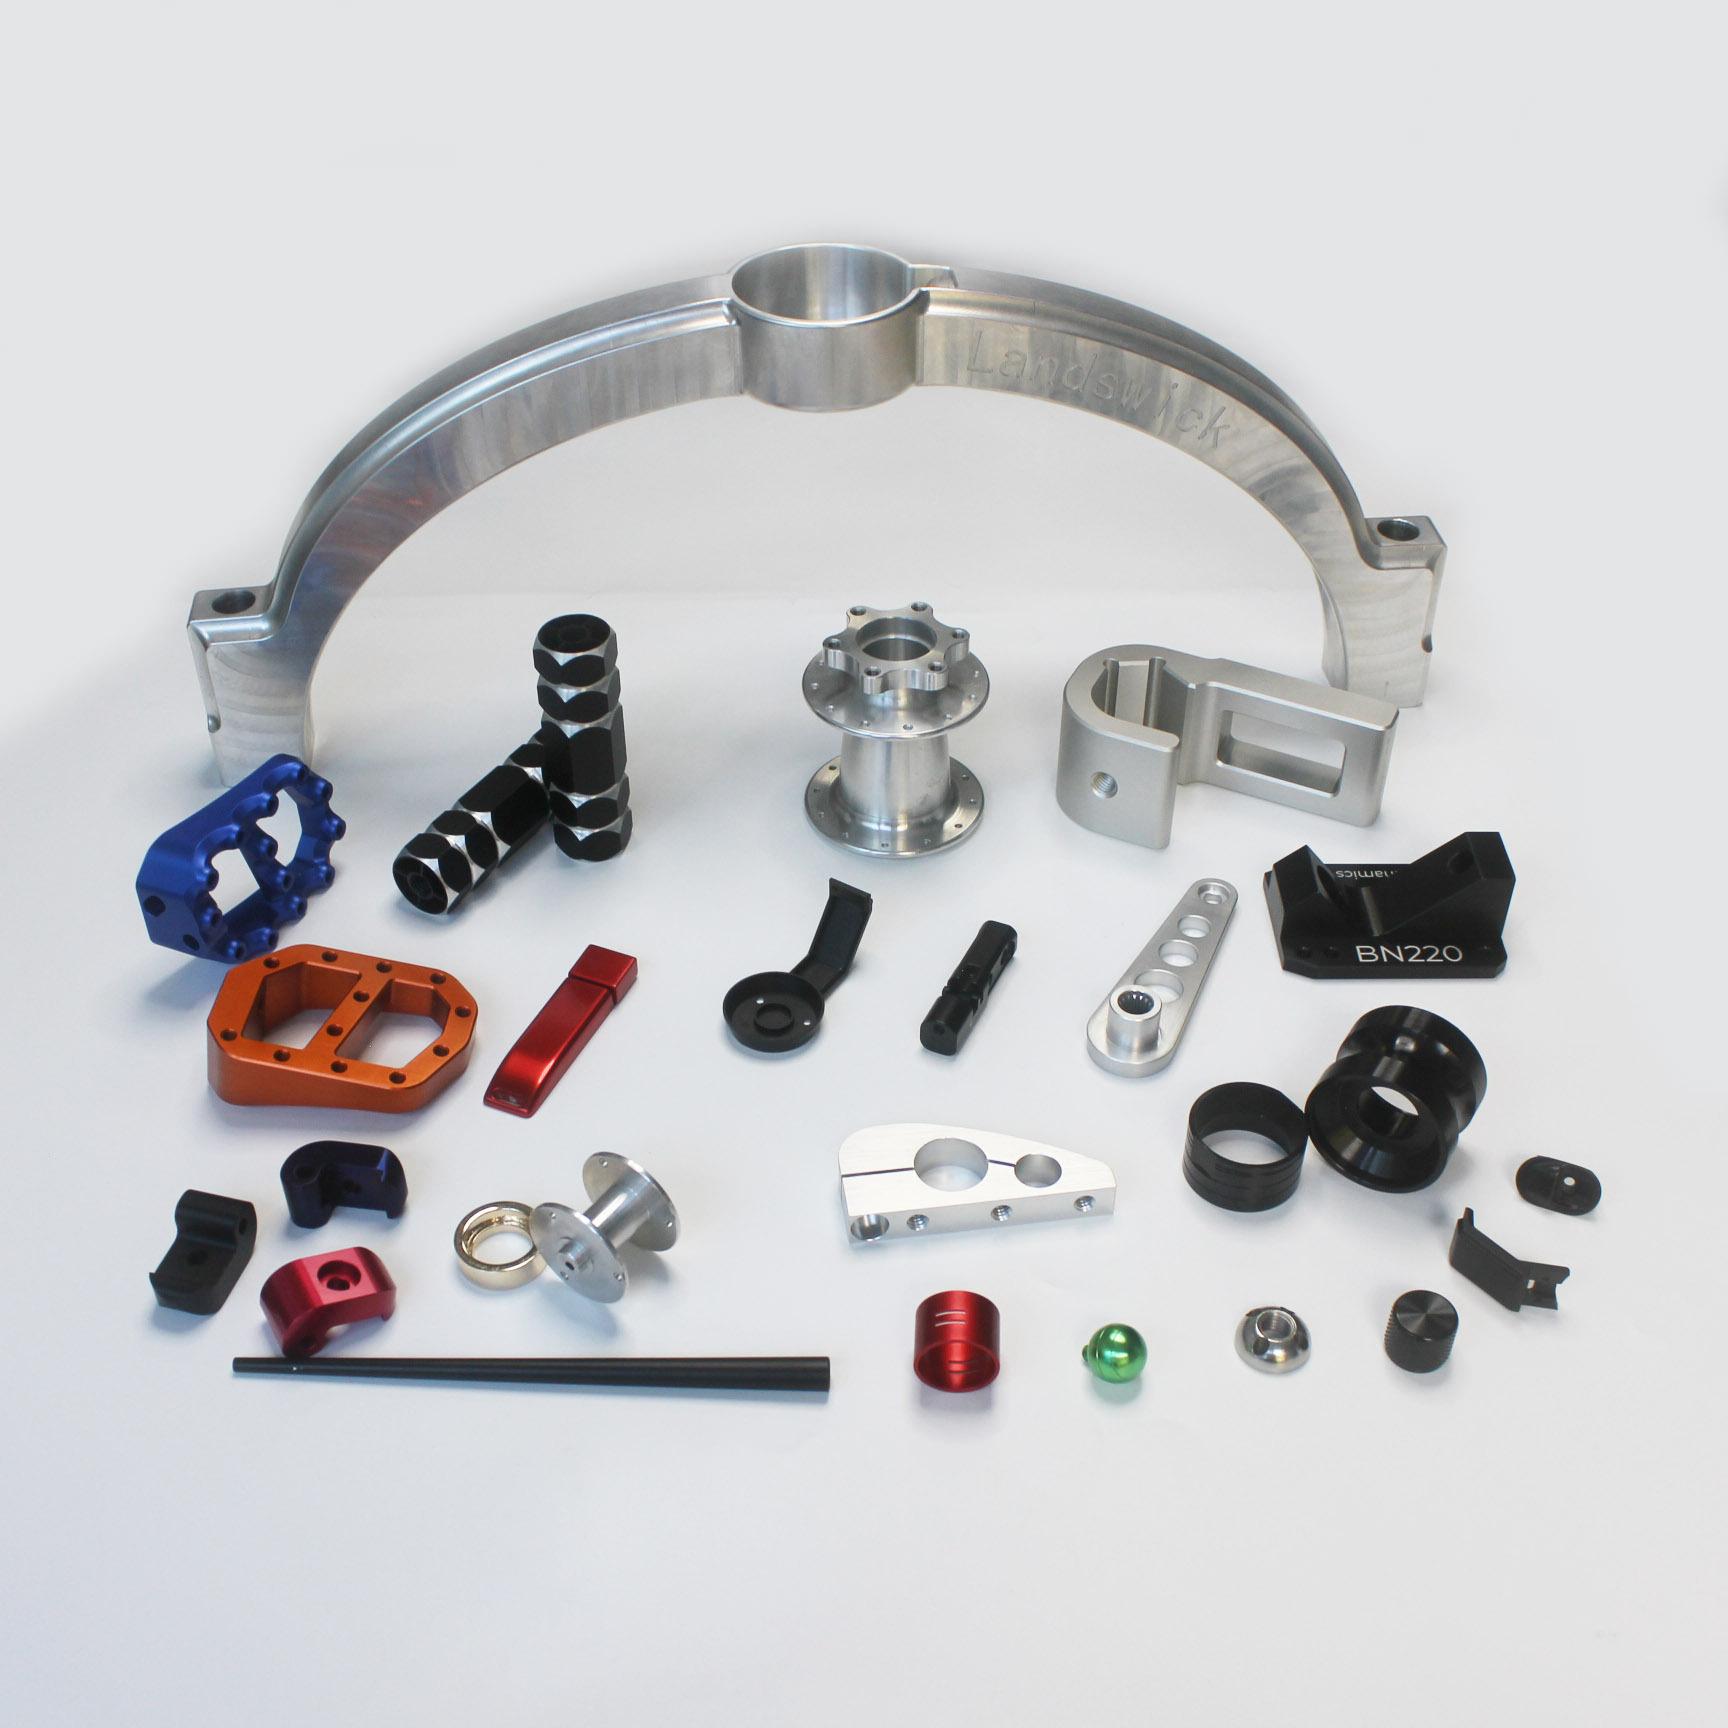 Stainless Steel Aluminum Machinery Bending Machine Parts